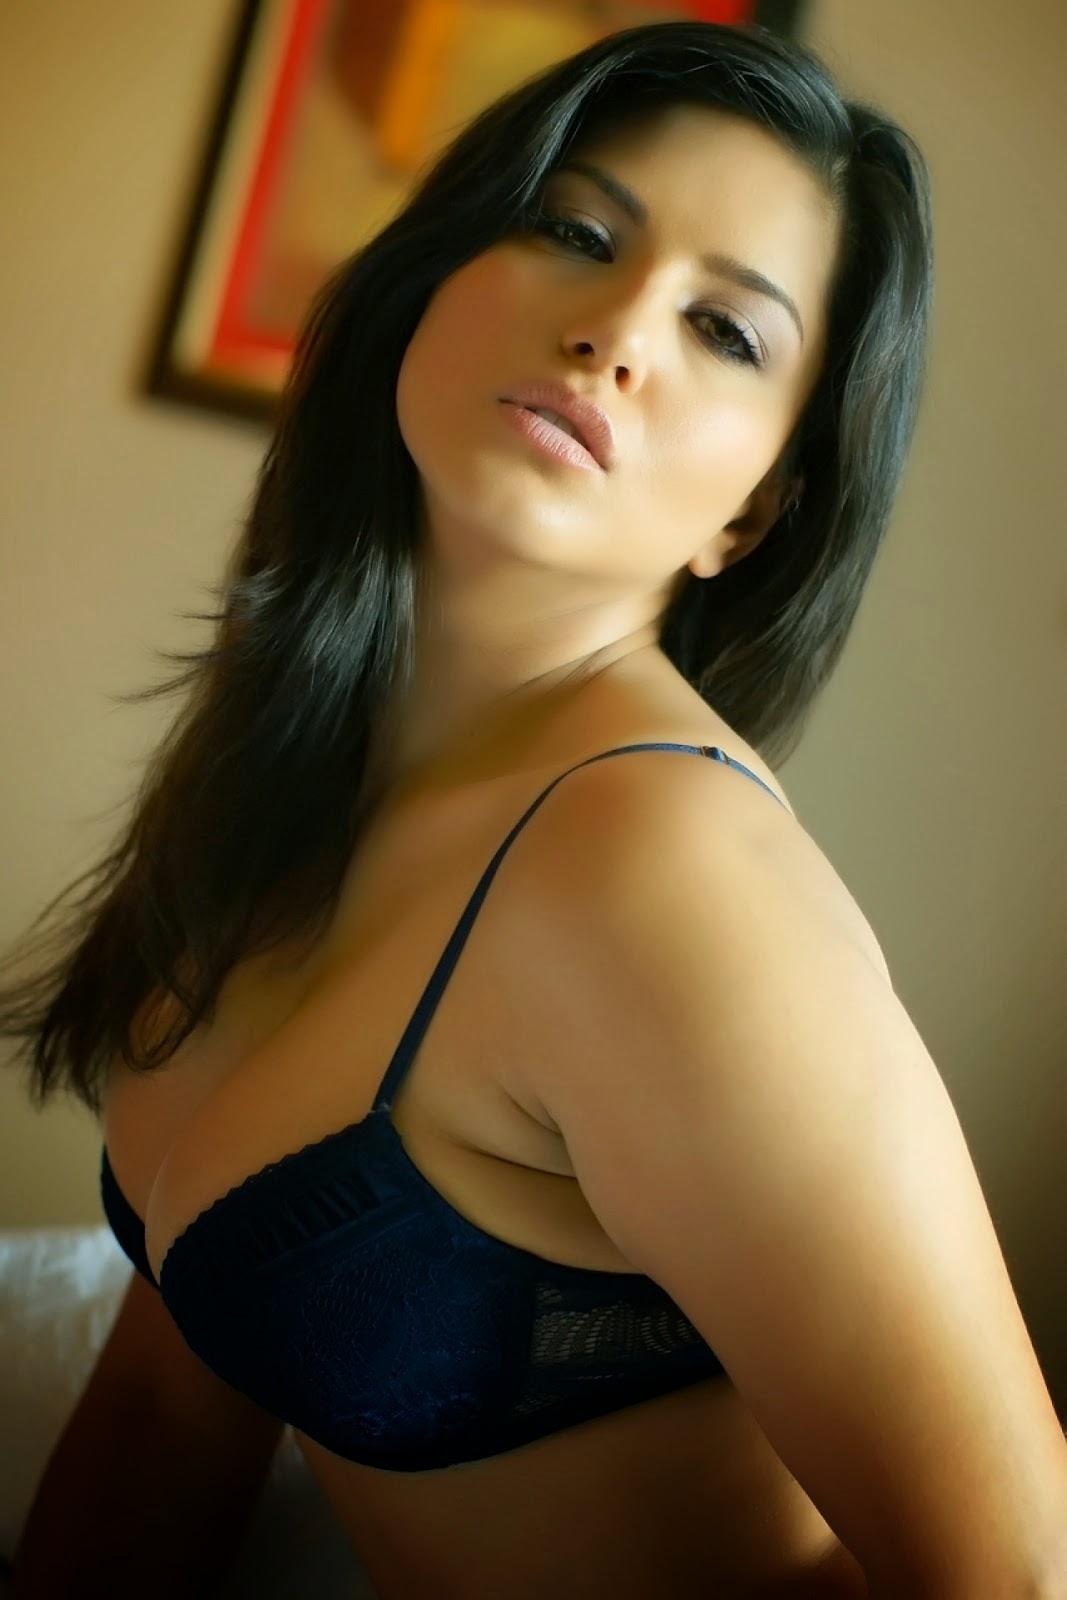 maria bellucci porn picture